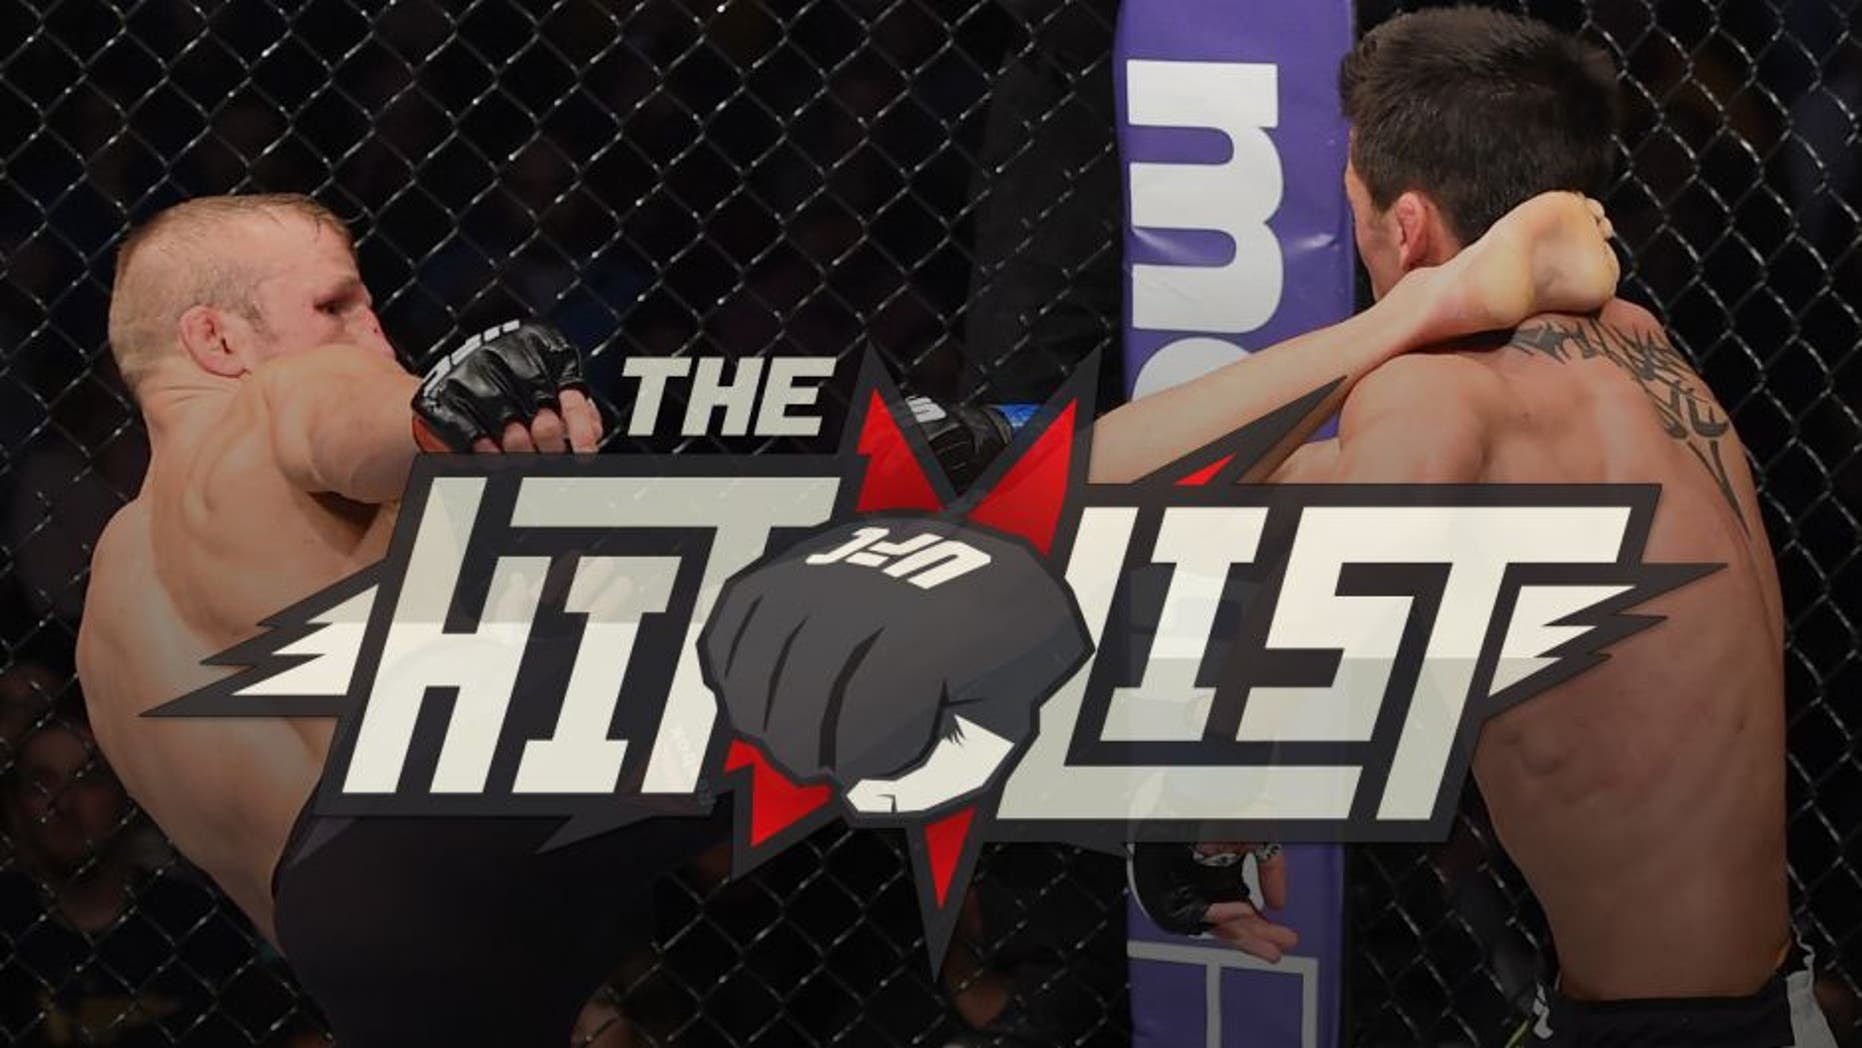 BOSTON, MA - JANUARY 17: (L-R) TJ Dillashaw kicks Dominick Cruz in their UFC bantamweight championship bout during the UFC Fight Night event inside TD Garden on January 17, 2016 in Boston, Massachusetts. (Photo by Jeff Bottari/Zuffa LLC/Zuffa LLC via Getty Images)